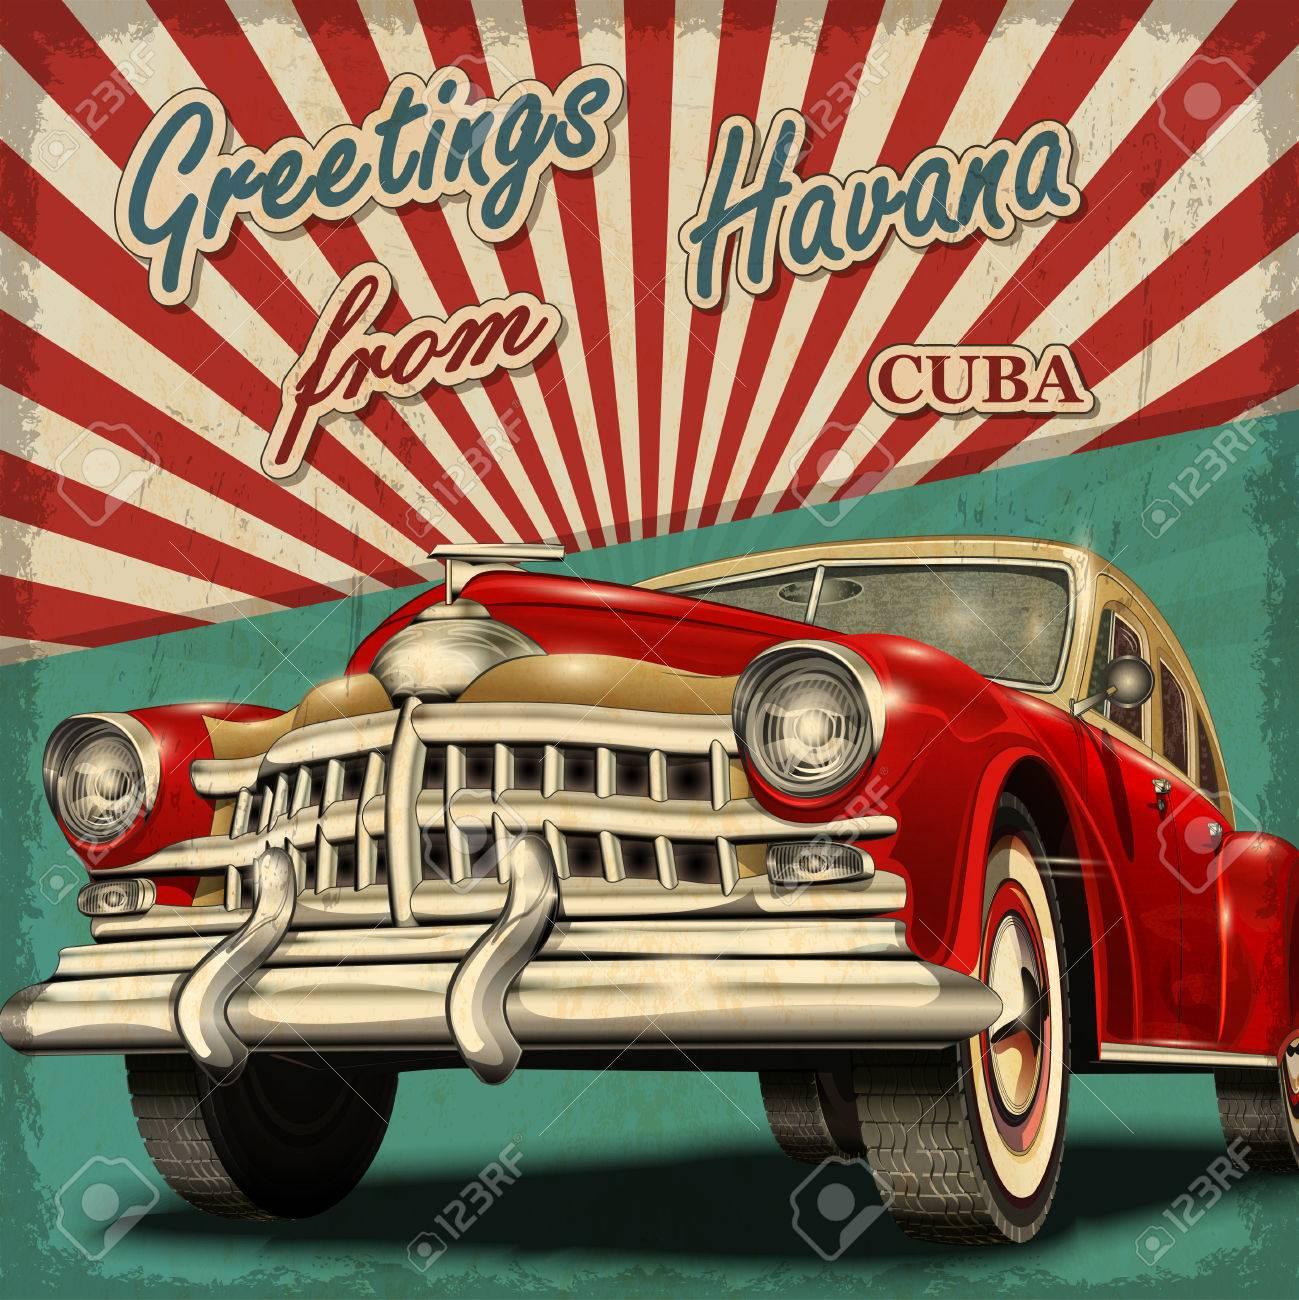 Vintage touristic greeting card with retro car.Havana.Cuba. - 70999407